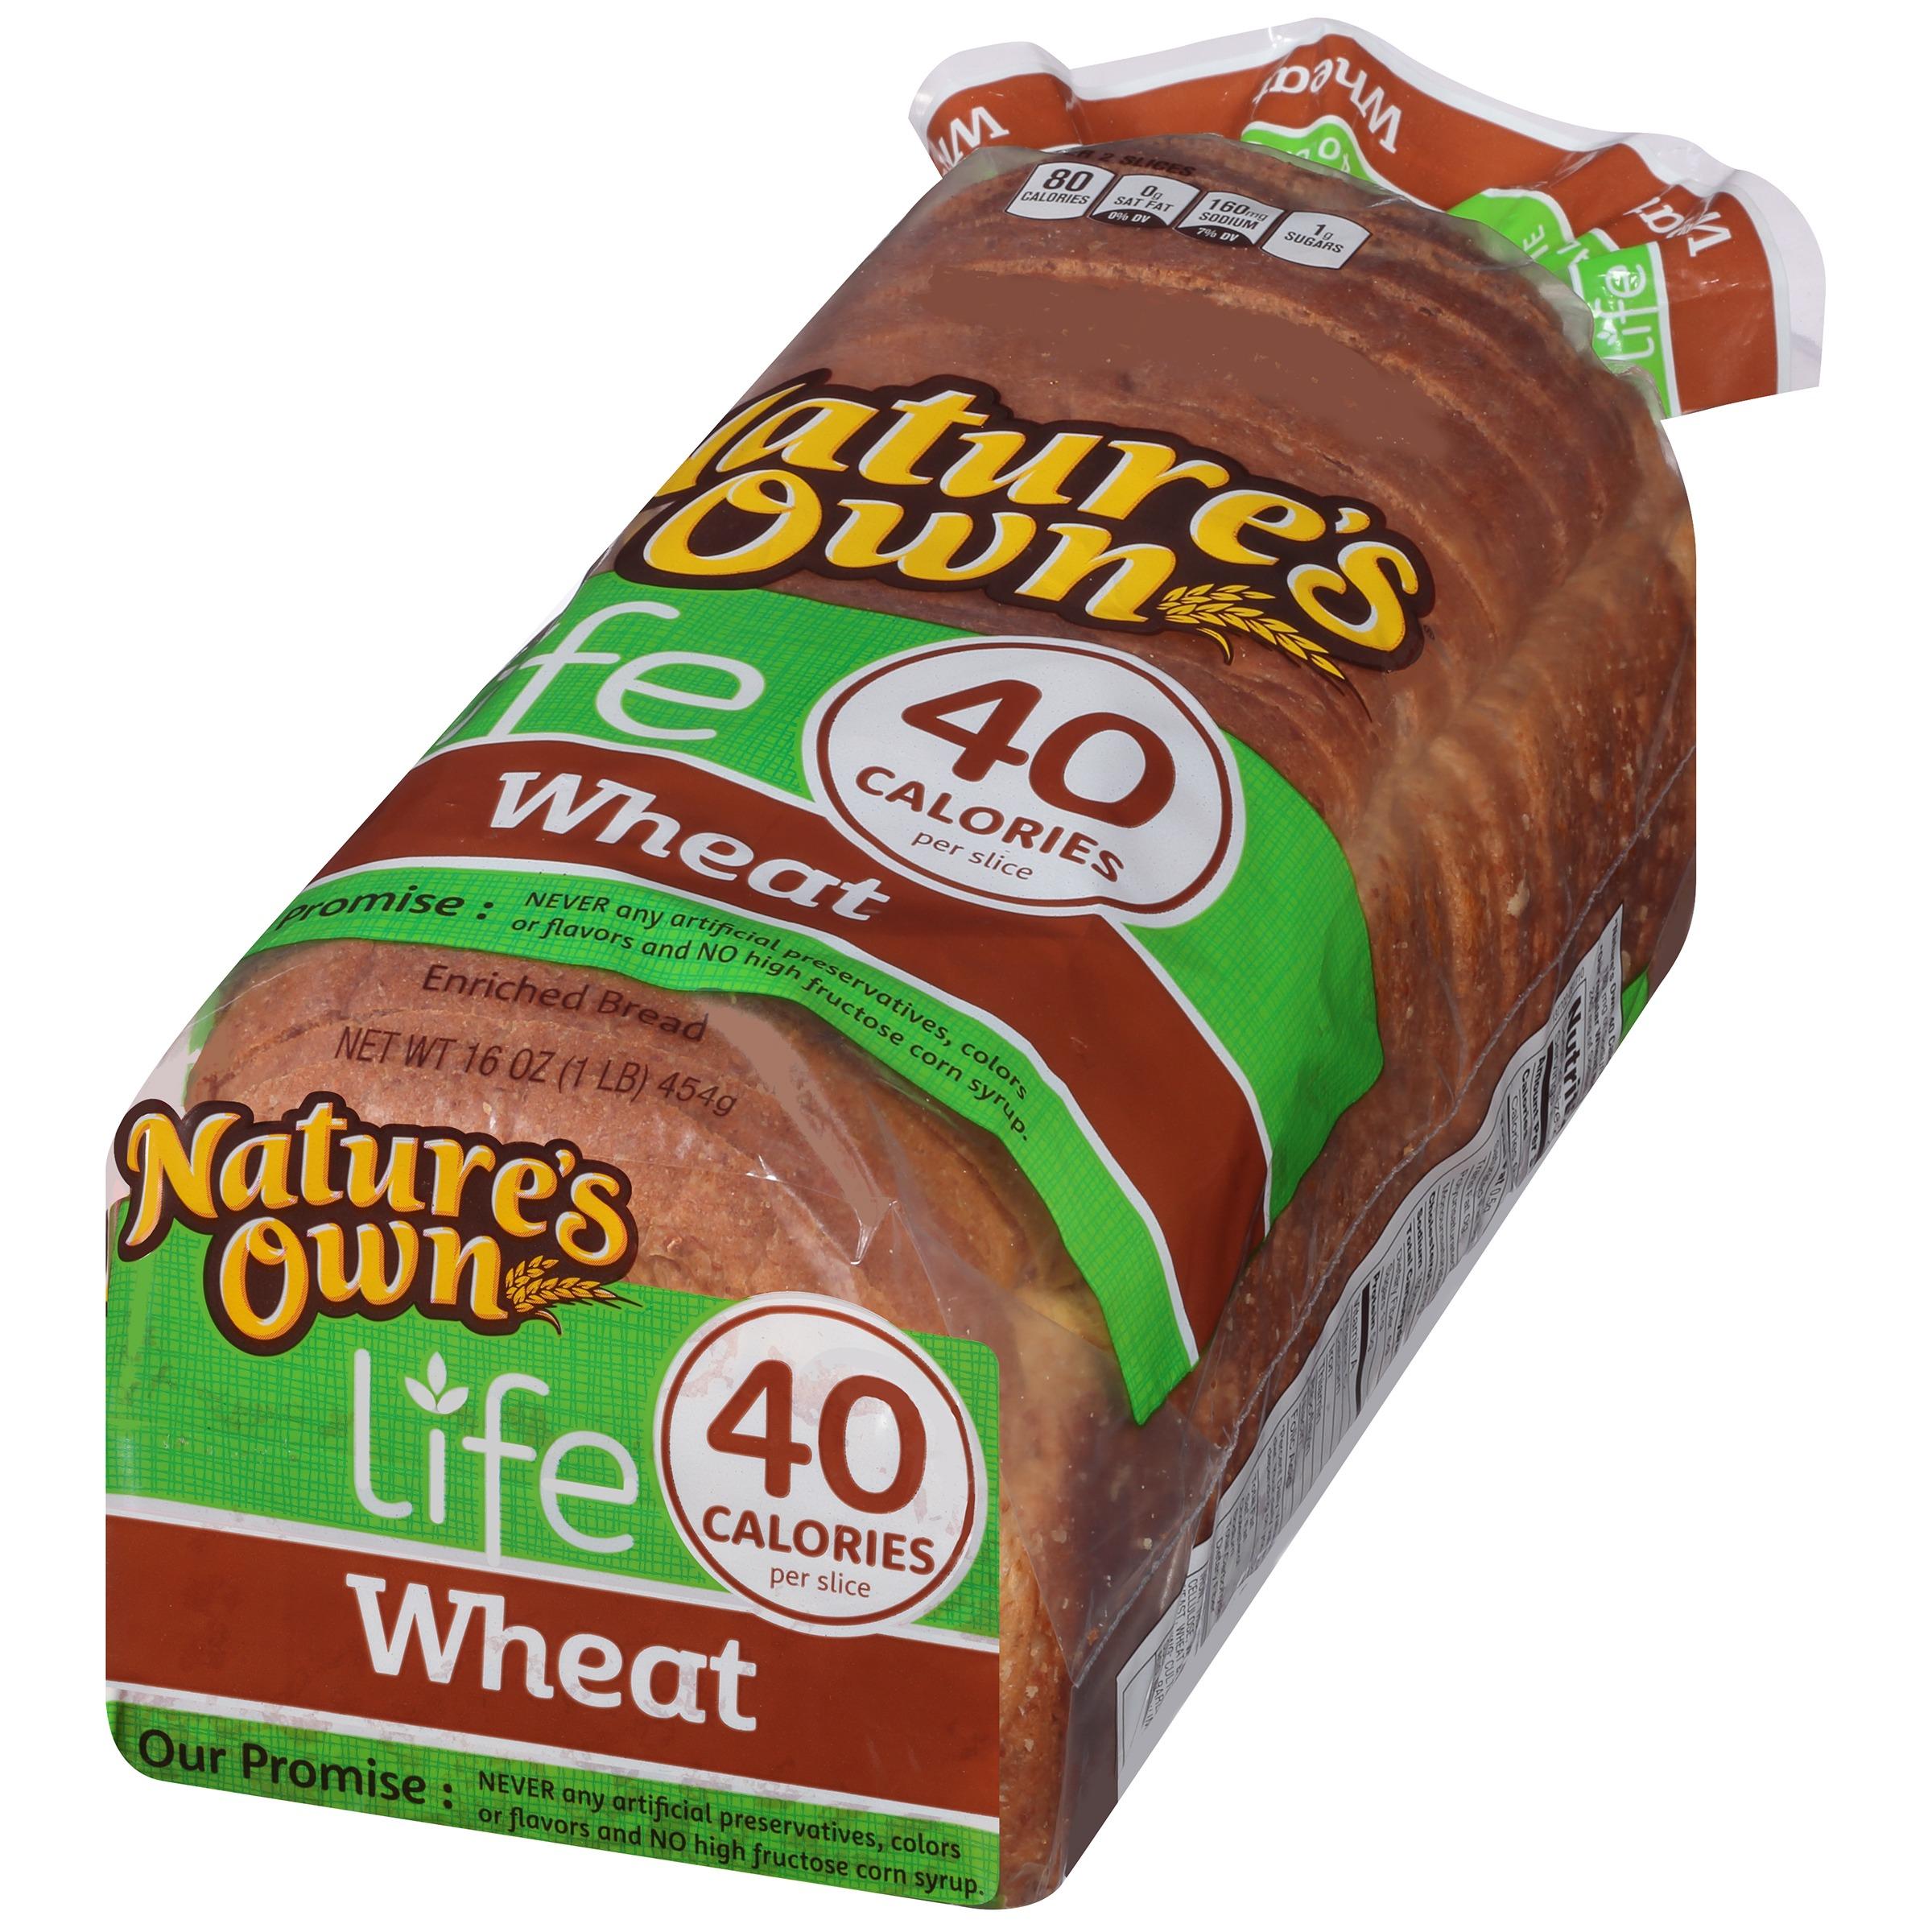 Life 40 Calorie Wheat Bread 16 oz. Bag